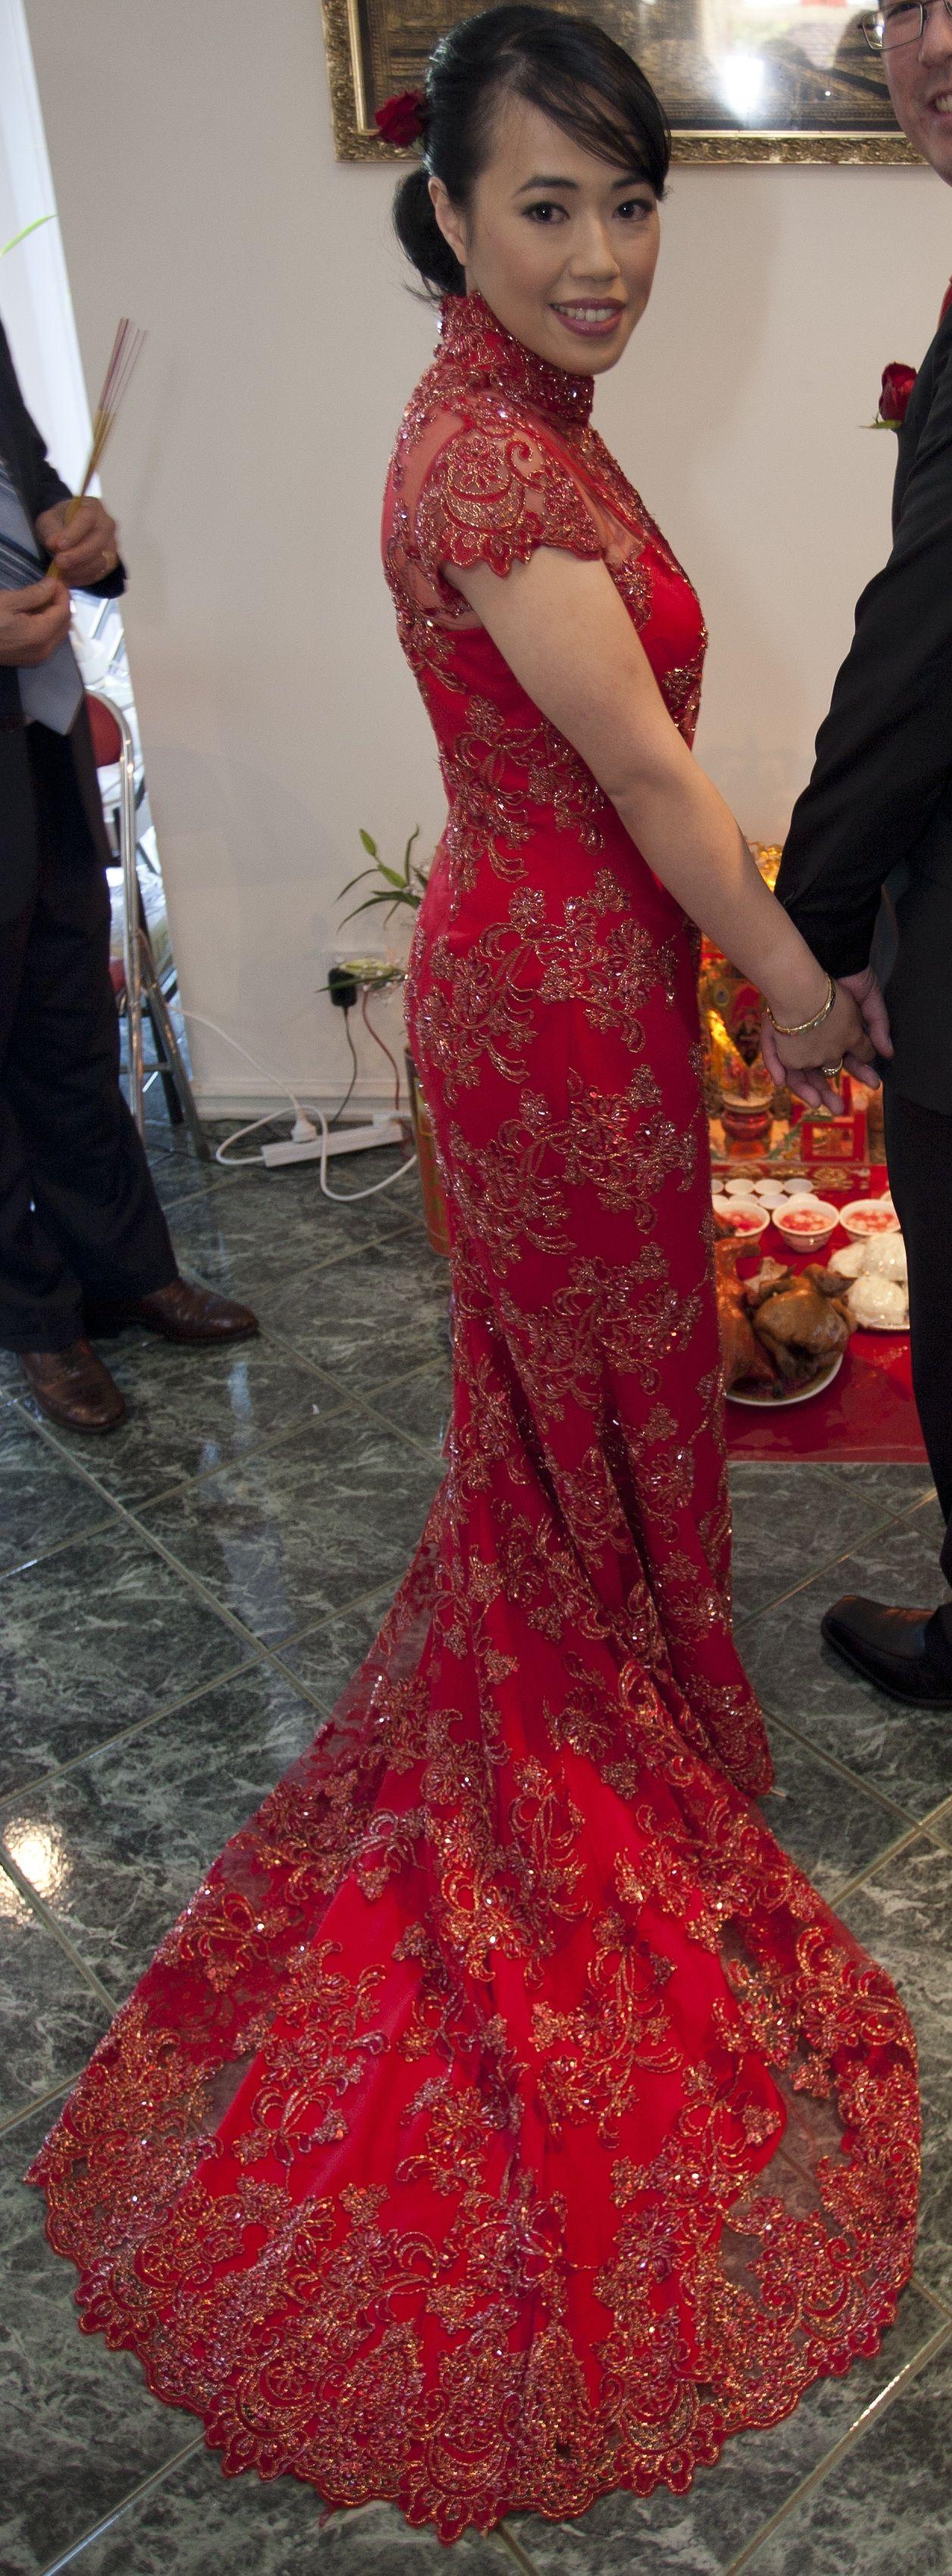 50++ Qipao wedding dress nyc information